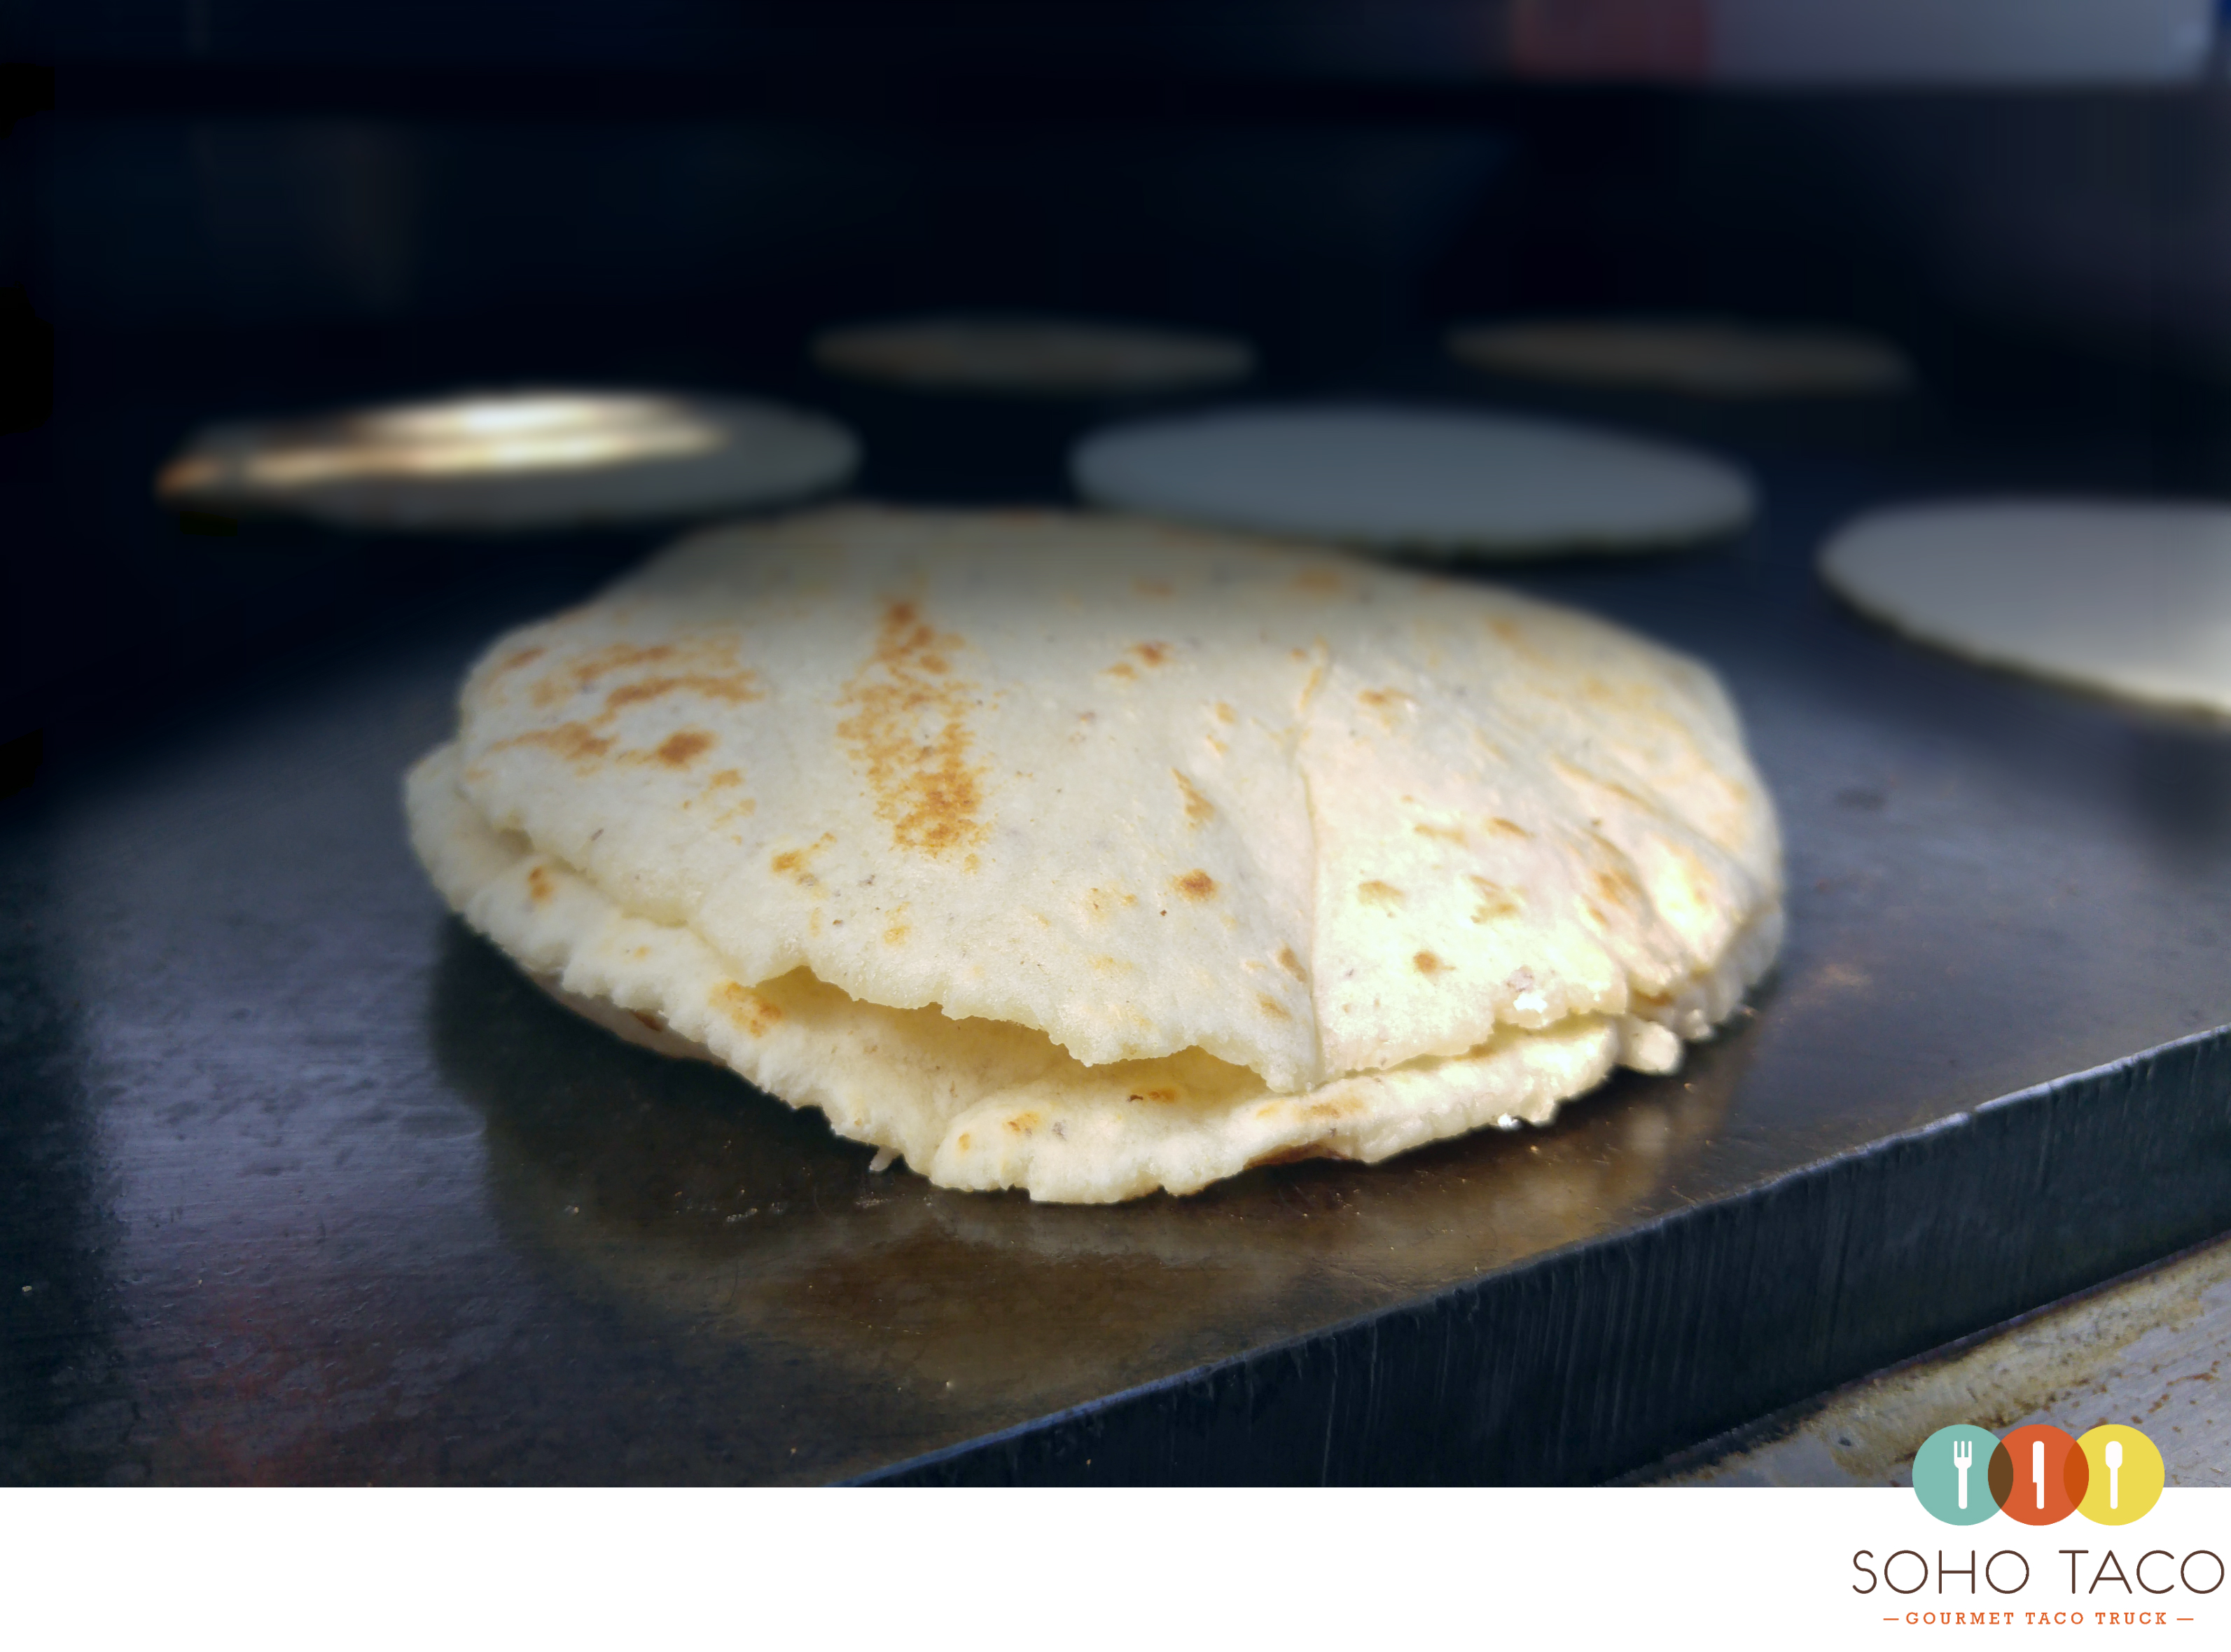 SOHO TACO Gourmet Taco Truck Catering - Earl Warren Showgrounds - Santa Barbara - Fresh Tortillas